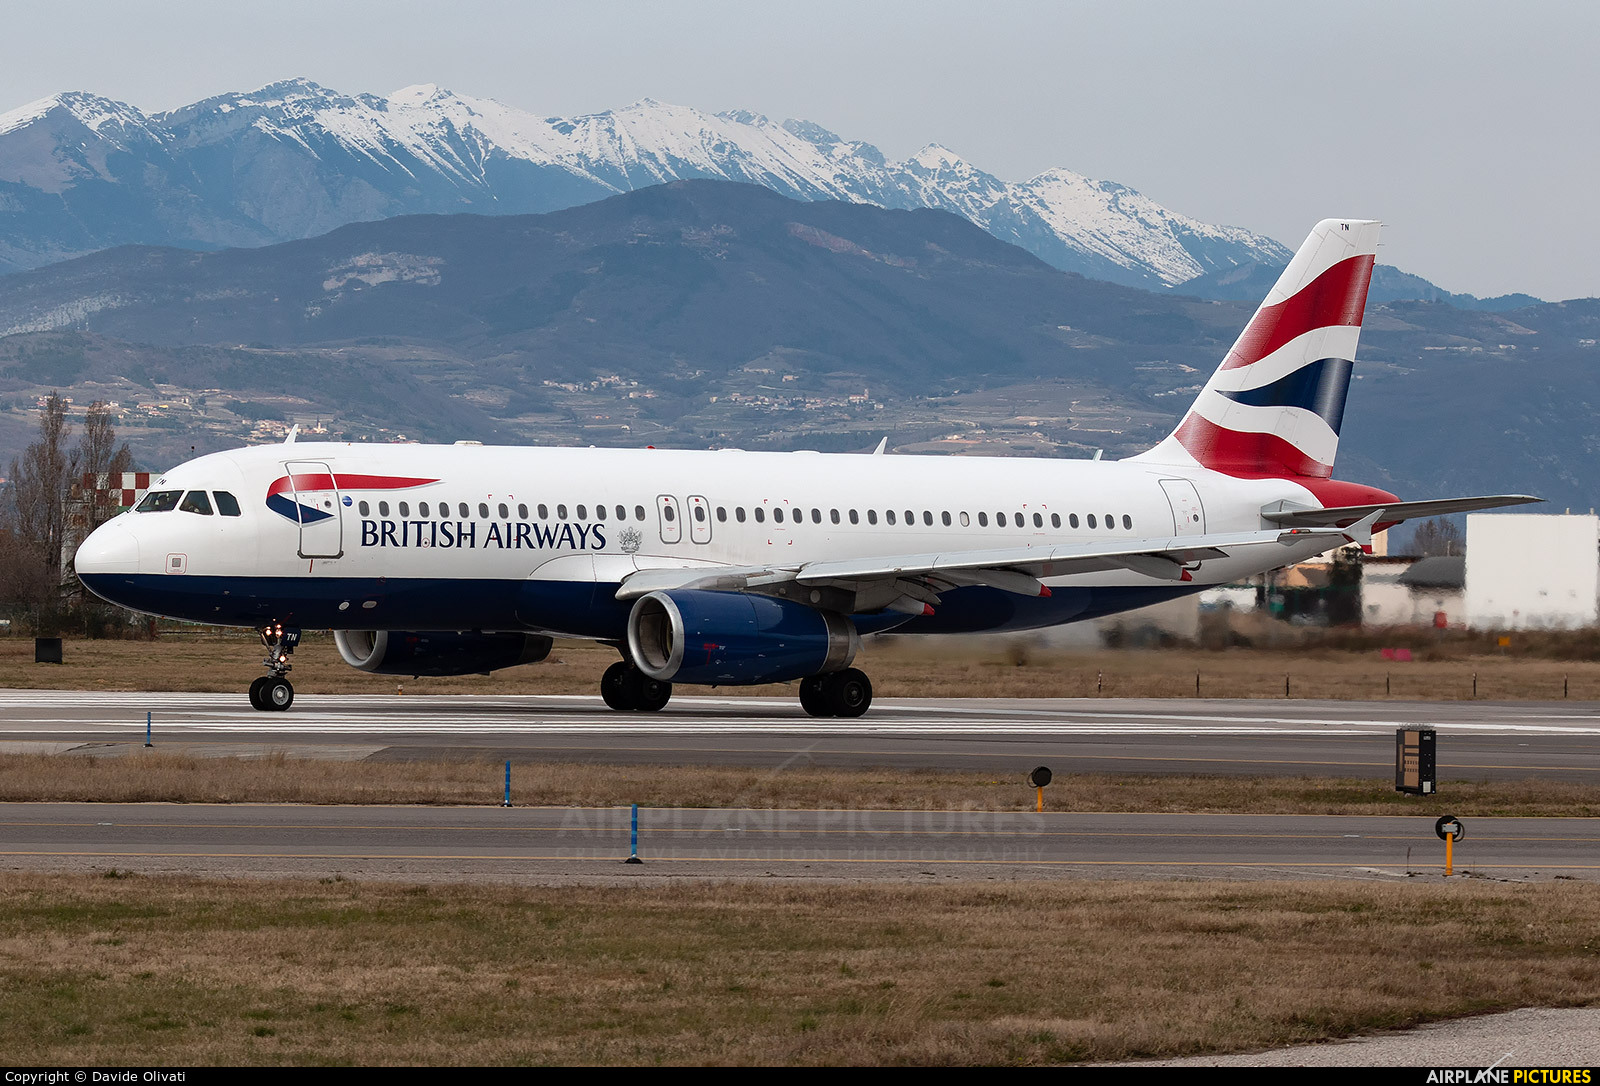 British Airways G-GATN aircraft at Verona - Villafranca